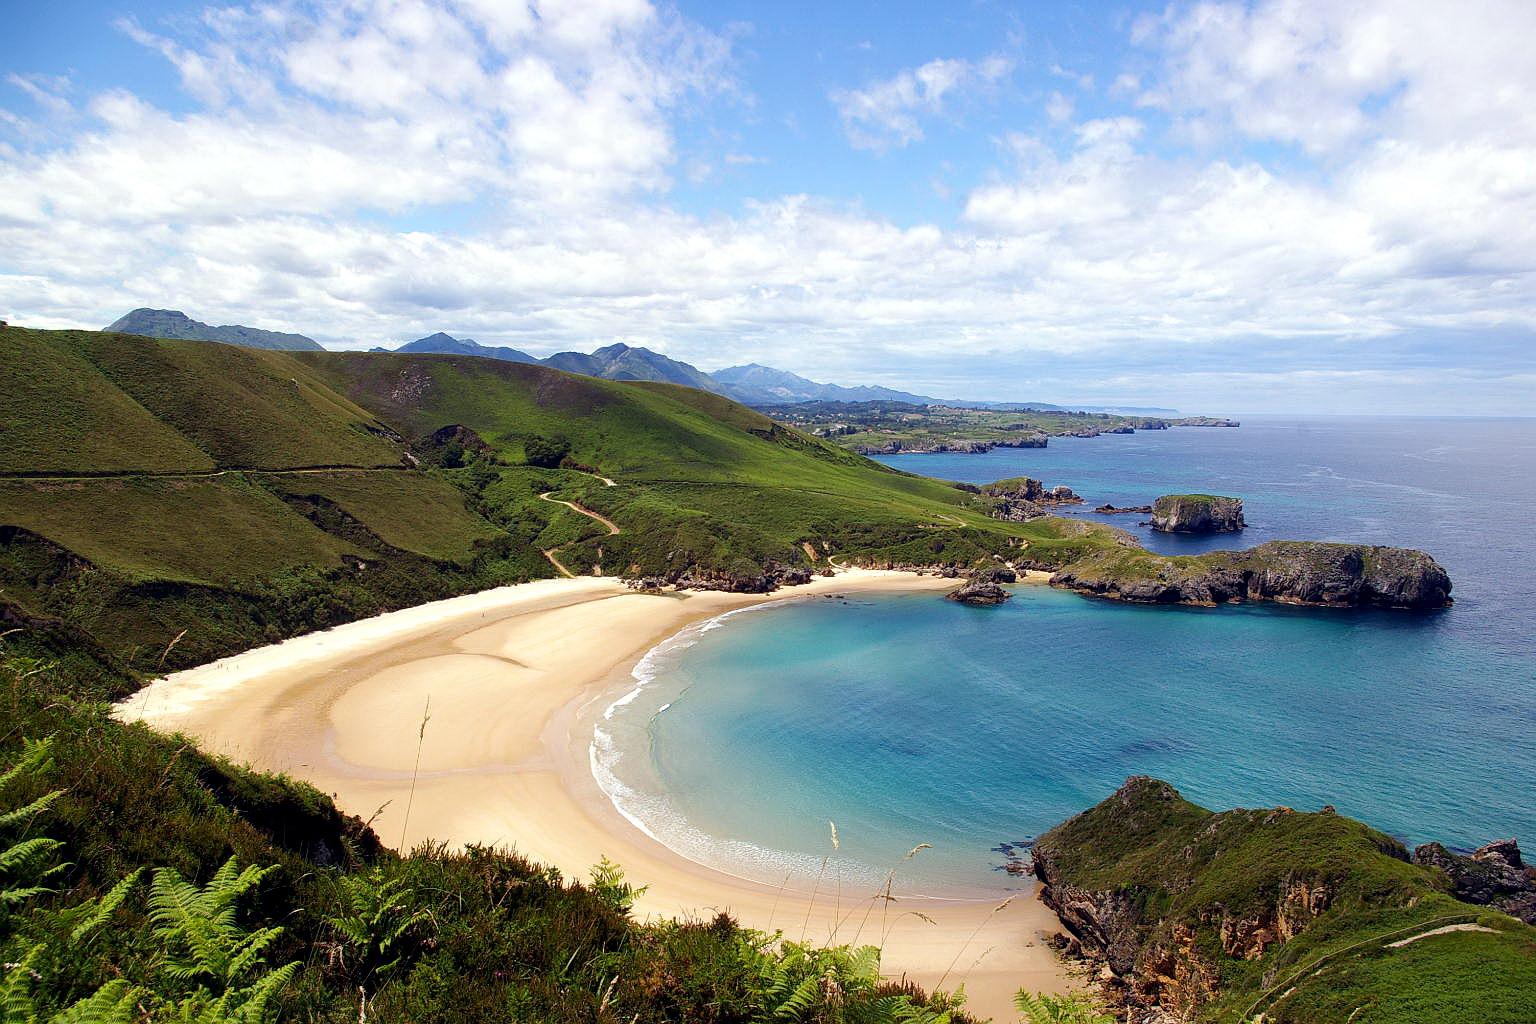 las mejores playas de asturias, asturias, playas, españa, las mejores playas